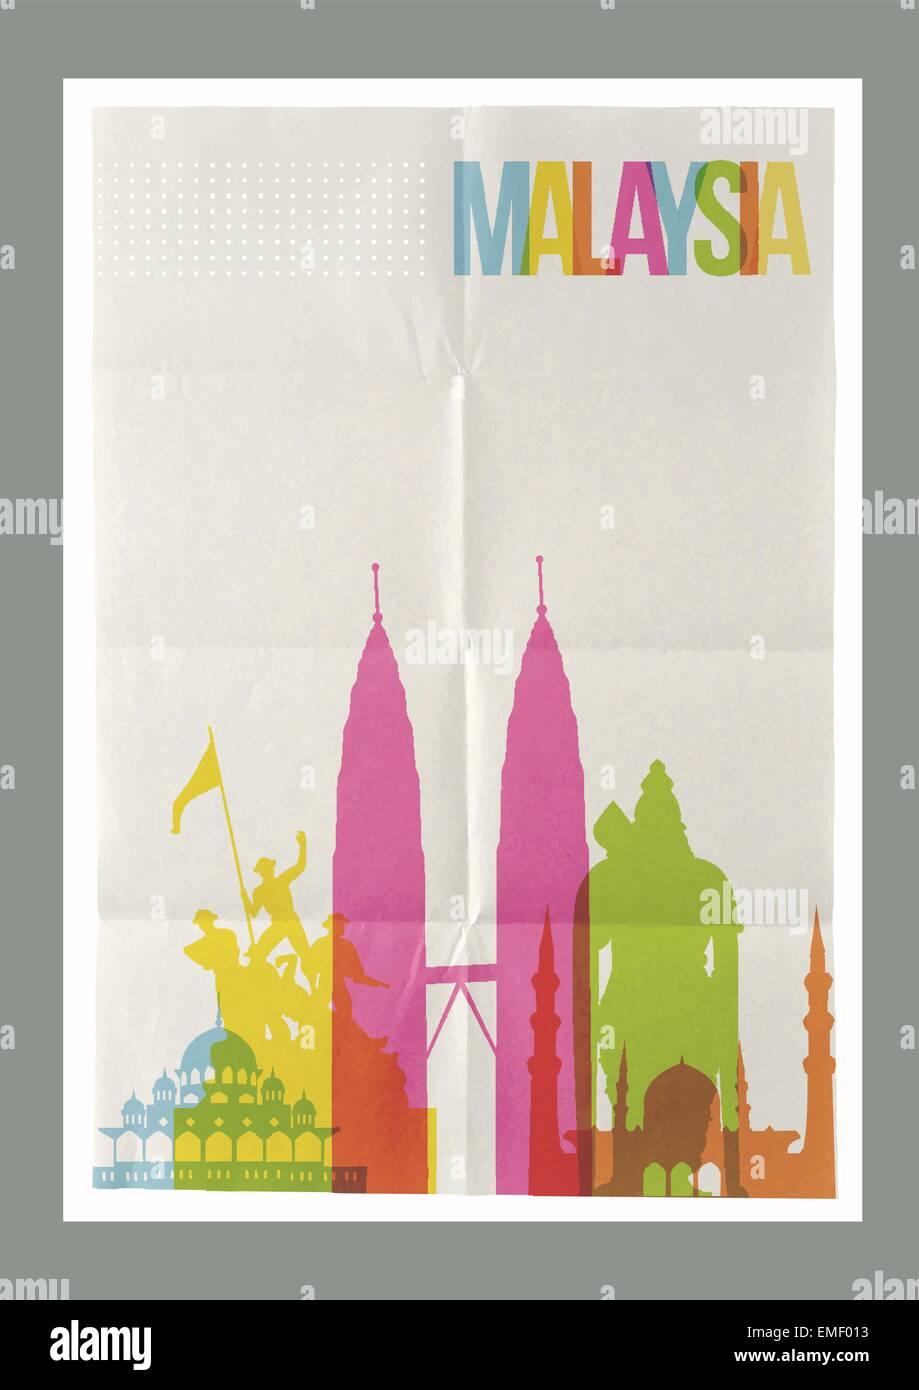 Travel Malaysia landmarks skyline vintage poster - Stock Vector